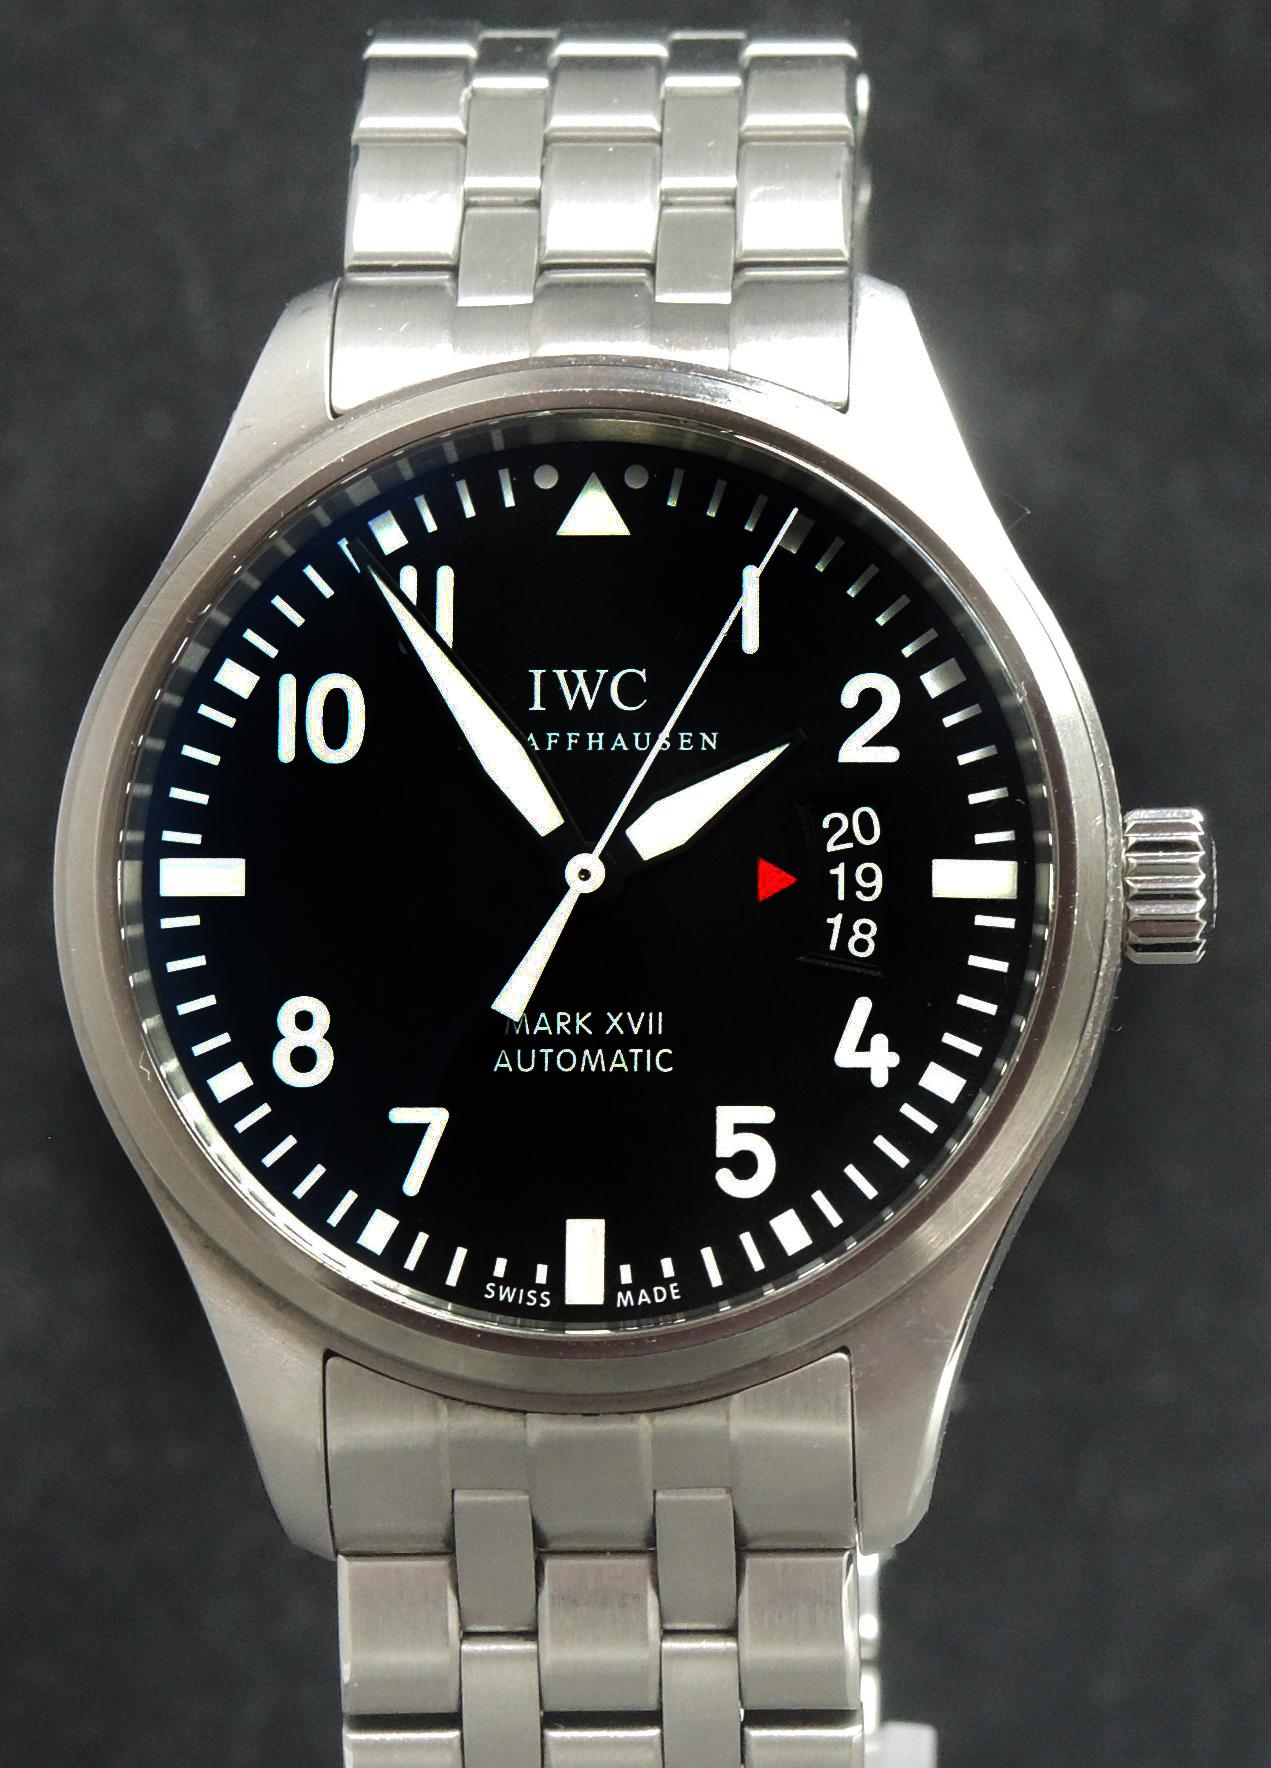 IWC Mark XVII Full Set with IWC Steel Bracelet